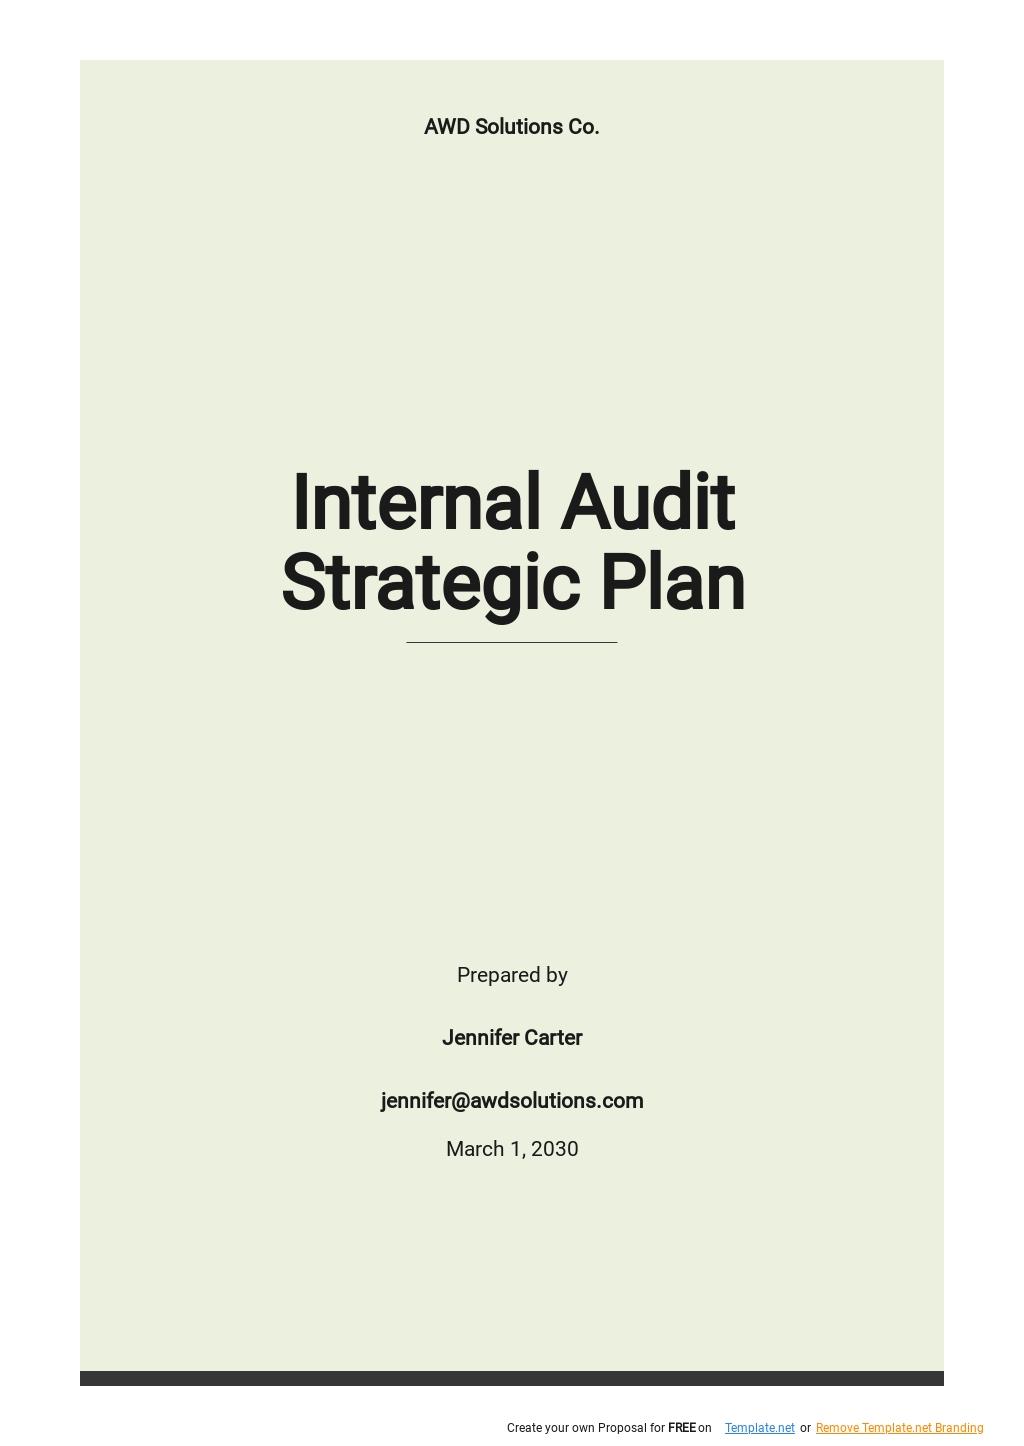 Internal Audit Strategic Plan Template.jpe